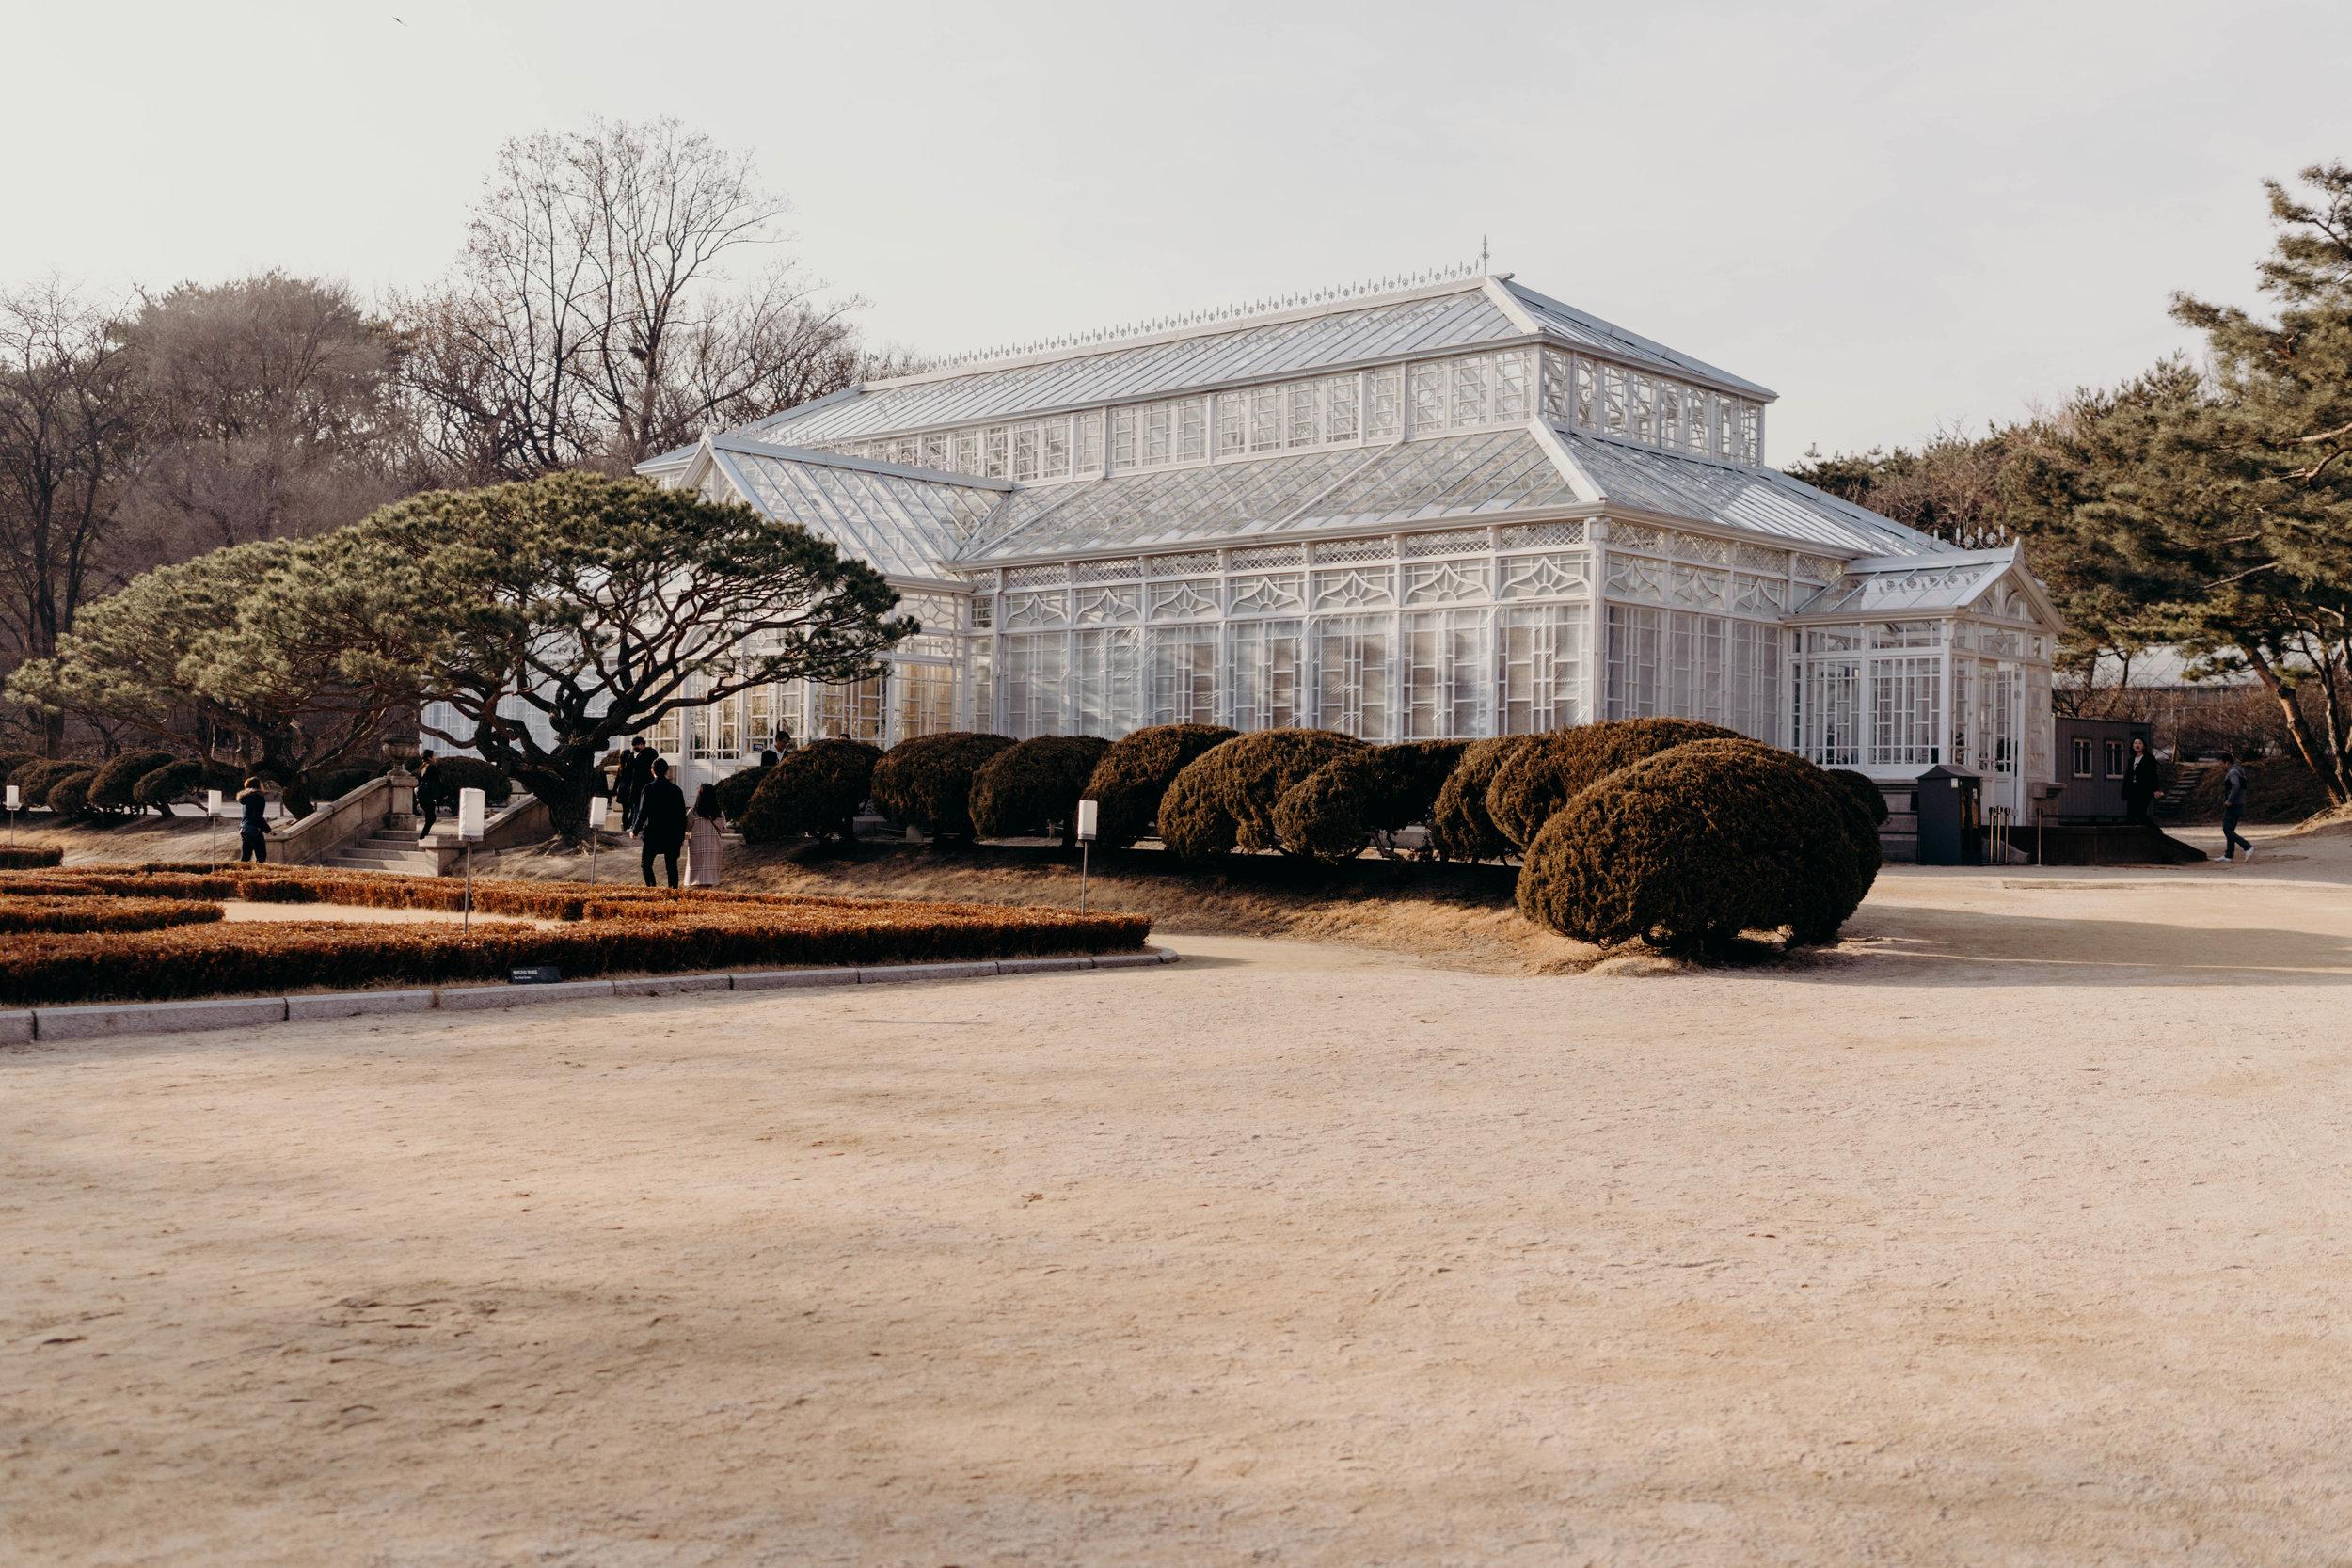 Daeonsil: The Great Greenhouse at Changgyeonggung | On the Street Where We Live ( aretherelilactrees.com )  Changgyeong Palace, Seoul, South Korea